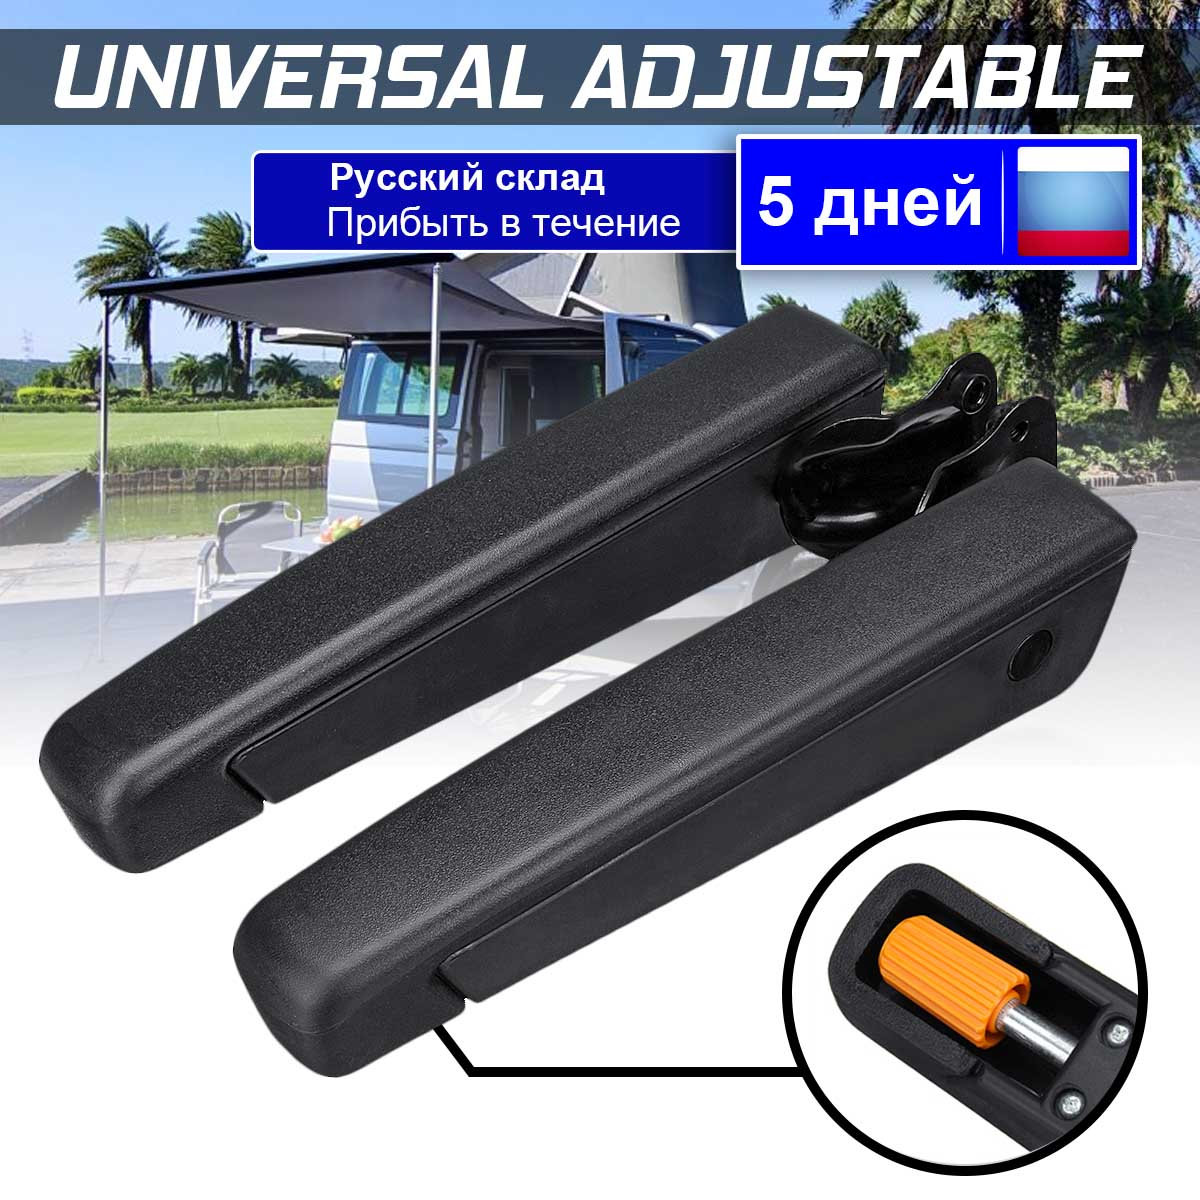 Universal Adjustable Car Seat Armrest  For RV Van Motorhome Boat Truck Car Accessories